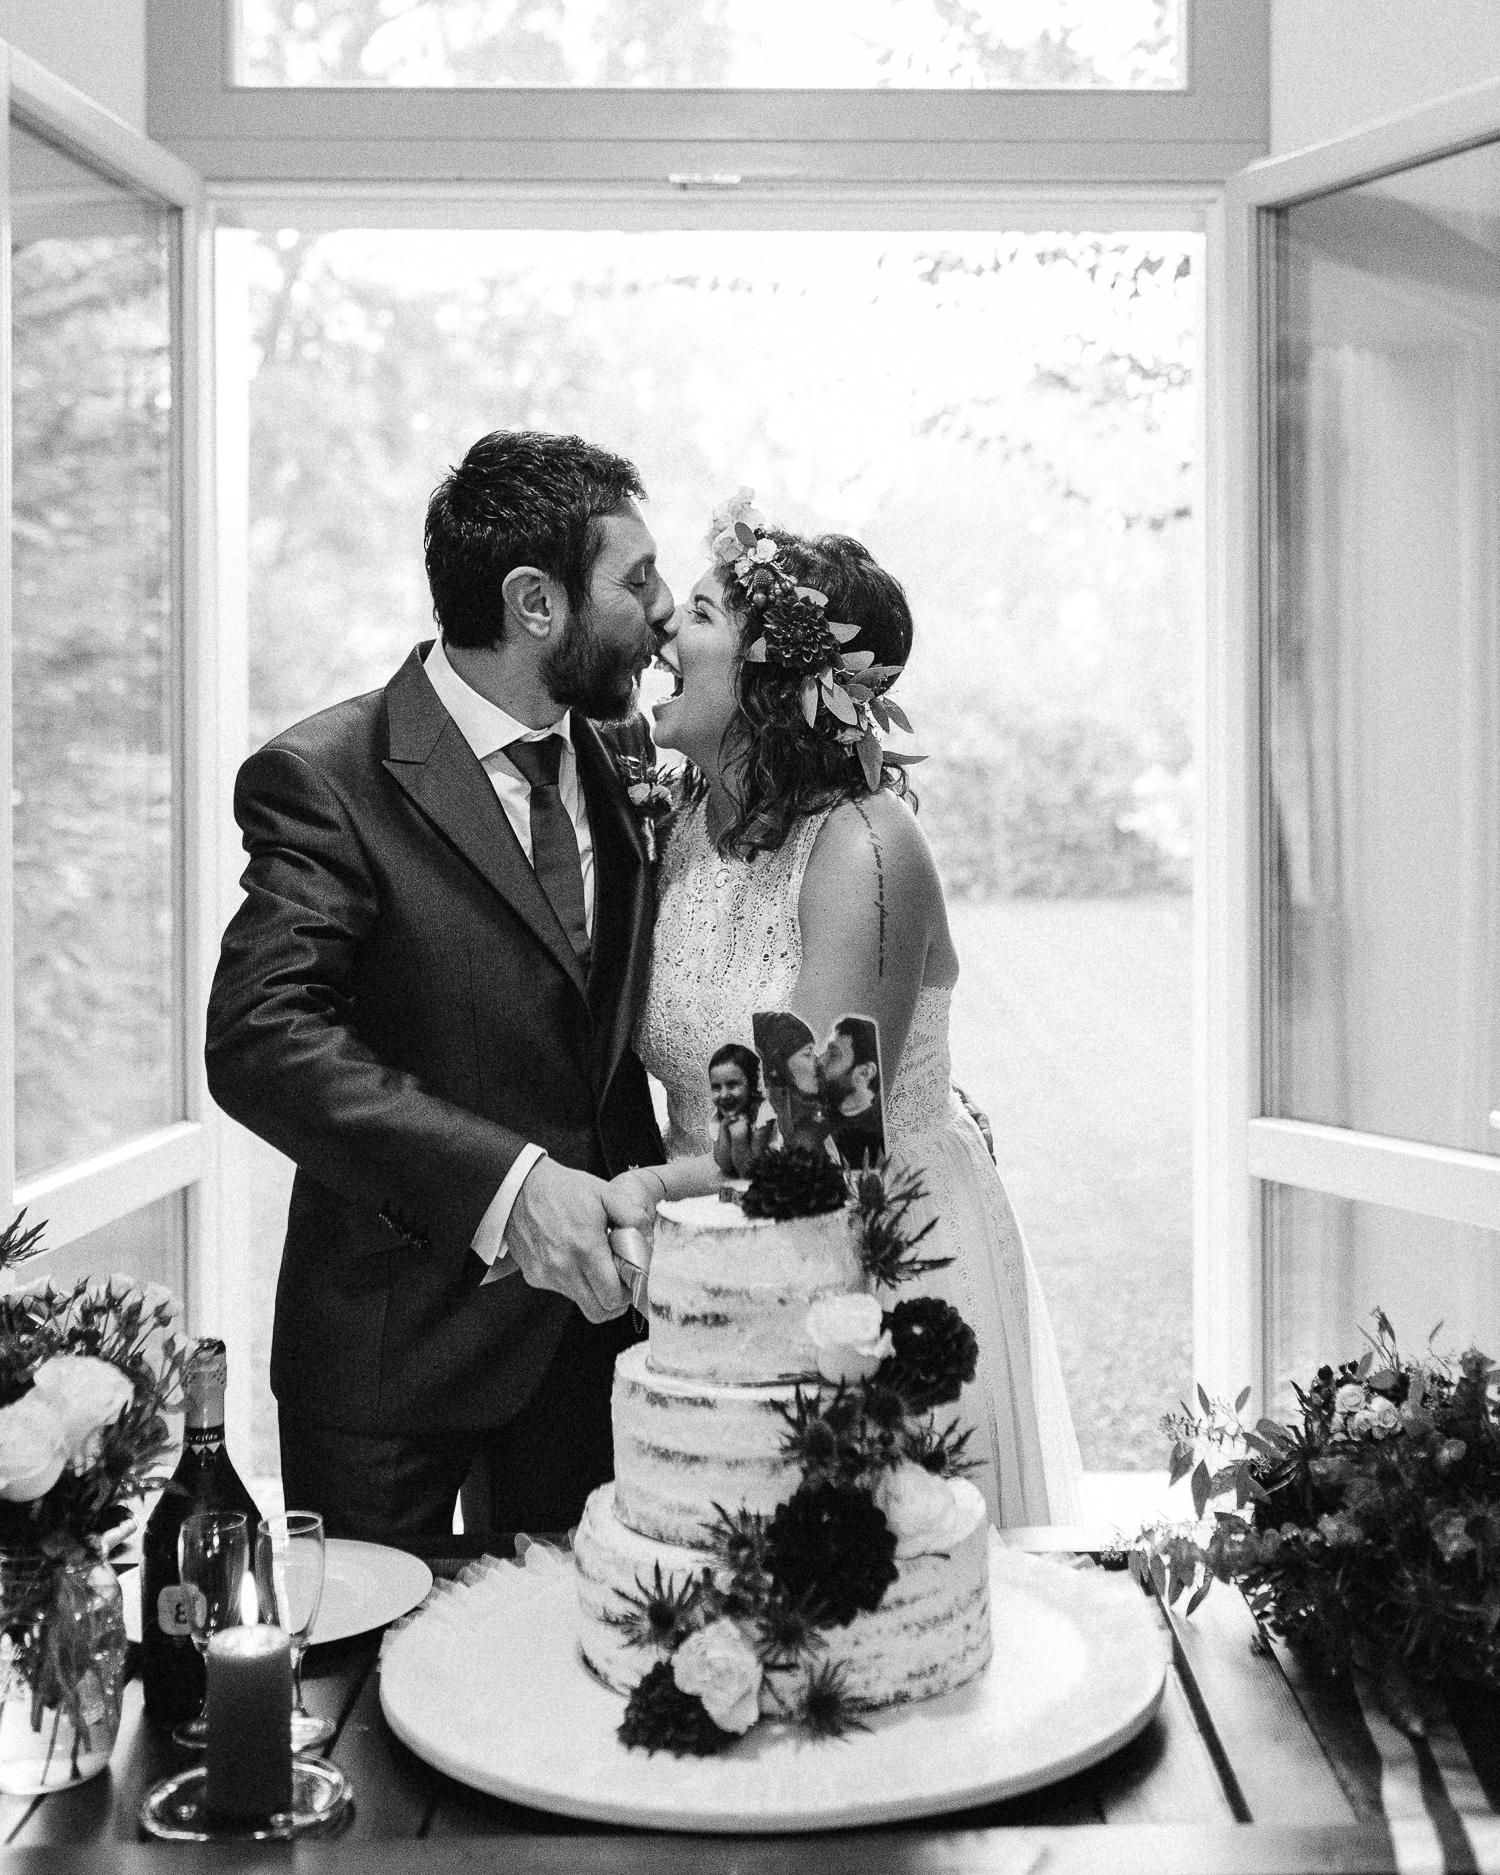 matrimonio-ai-tre-tesori-fotografo-ferrara-enrique-olvera-photography-73